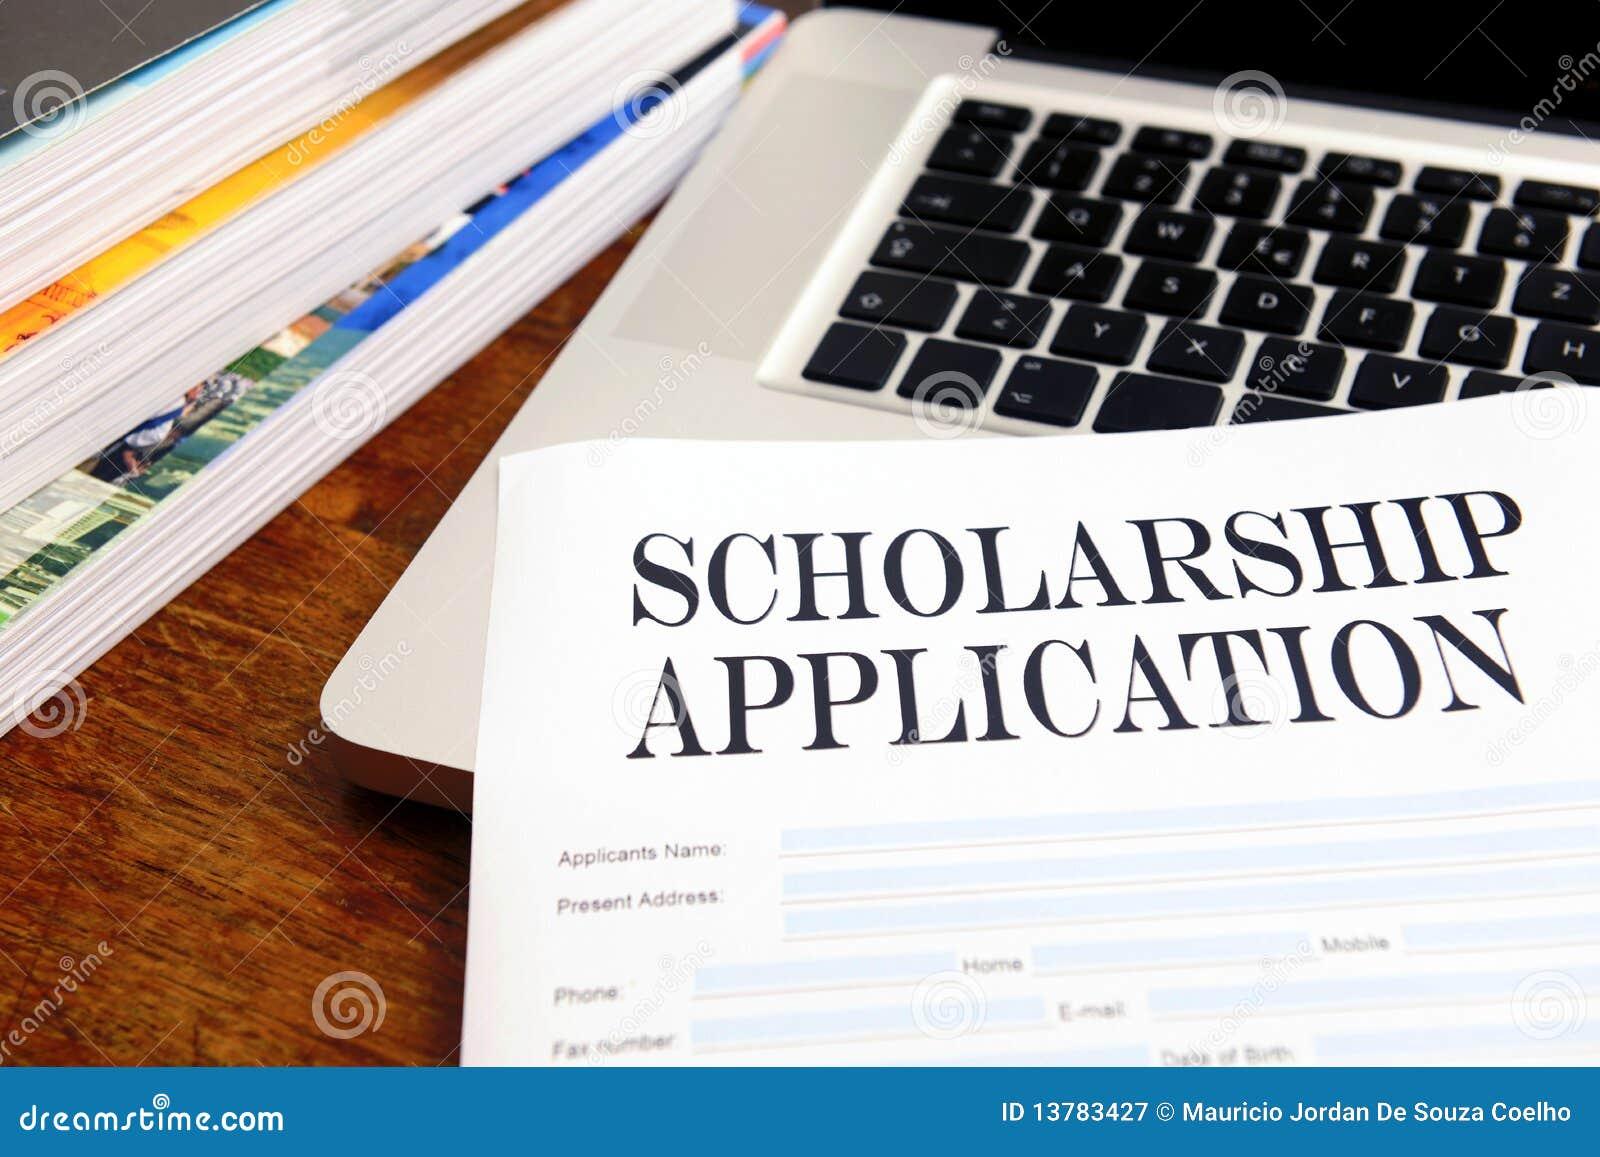 Blank scholarship application on desktop